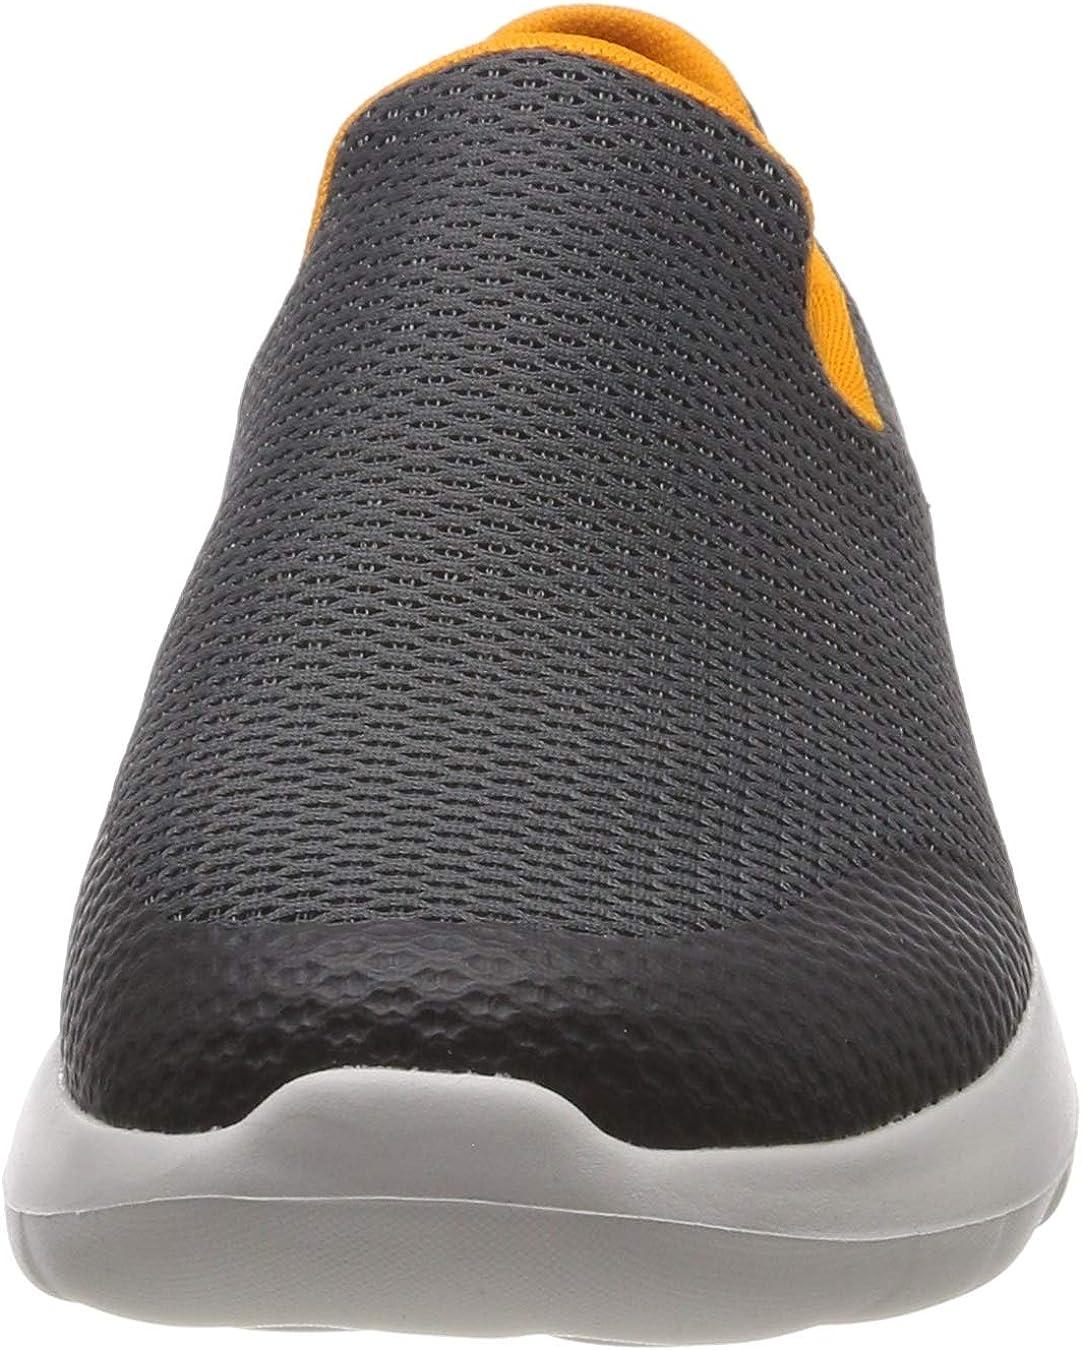 GO Walk MAX-Focal Sneaker